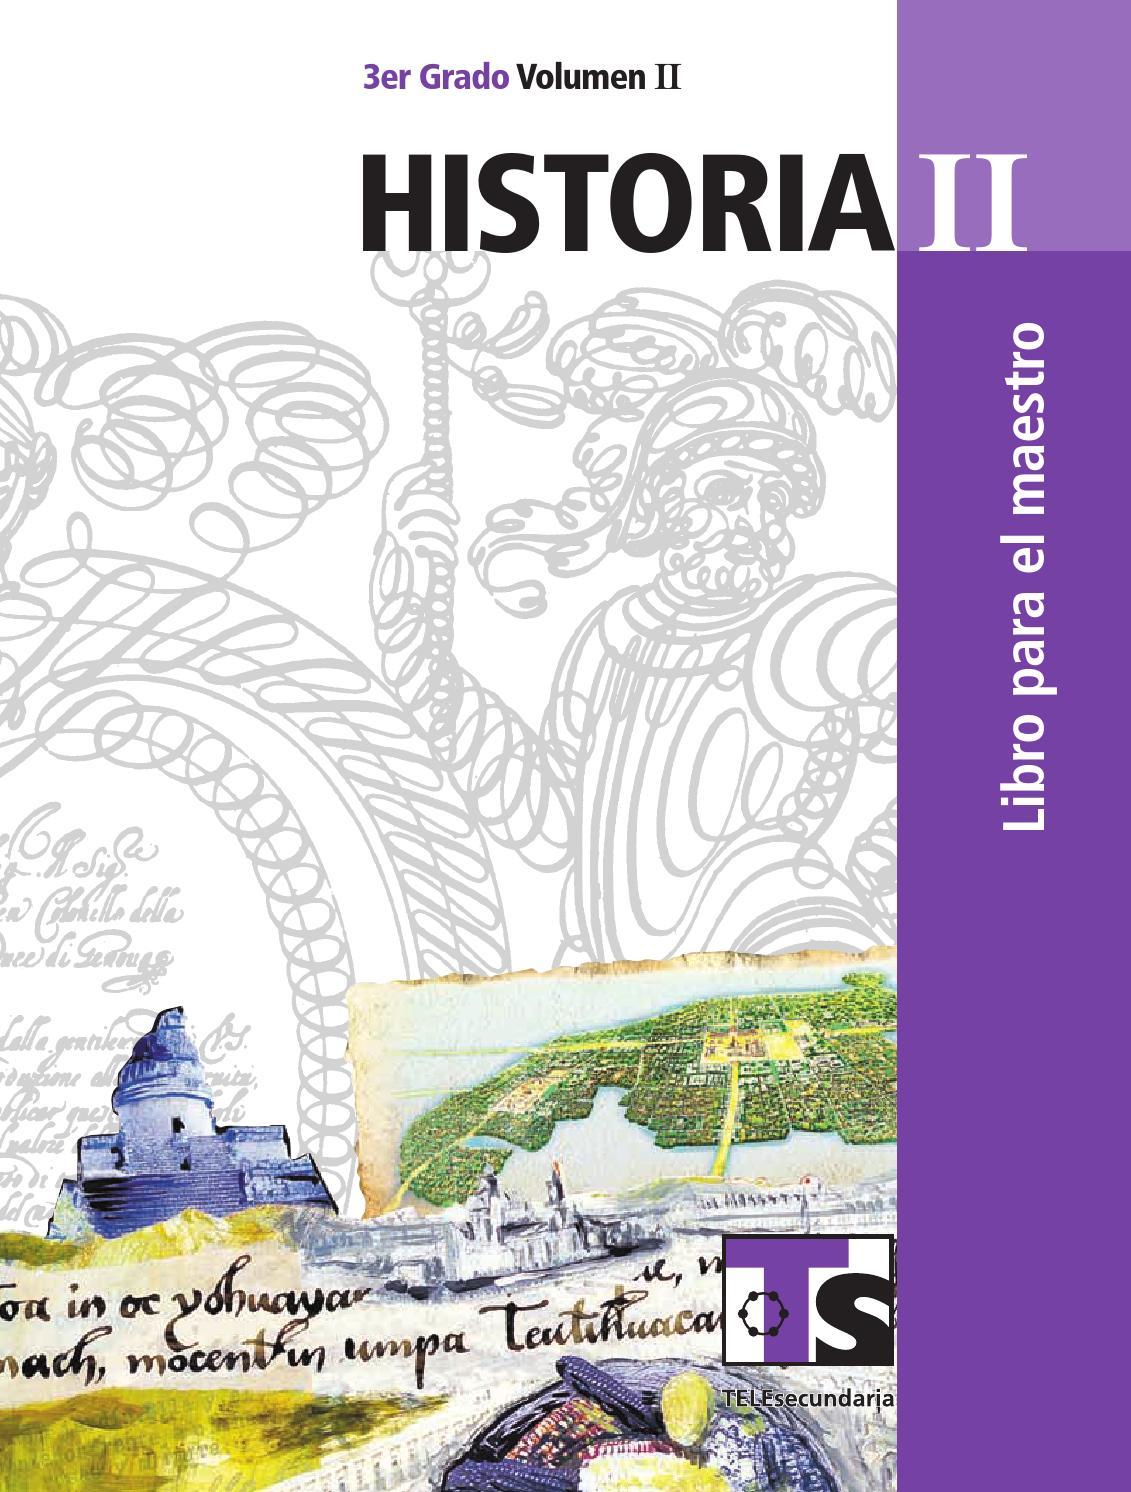 Maestro. Historia 3er. Grado Volumen II by Rarámuri - issuu